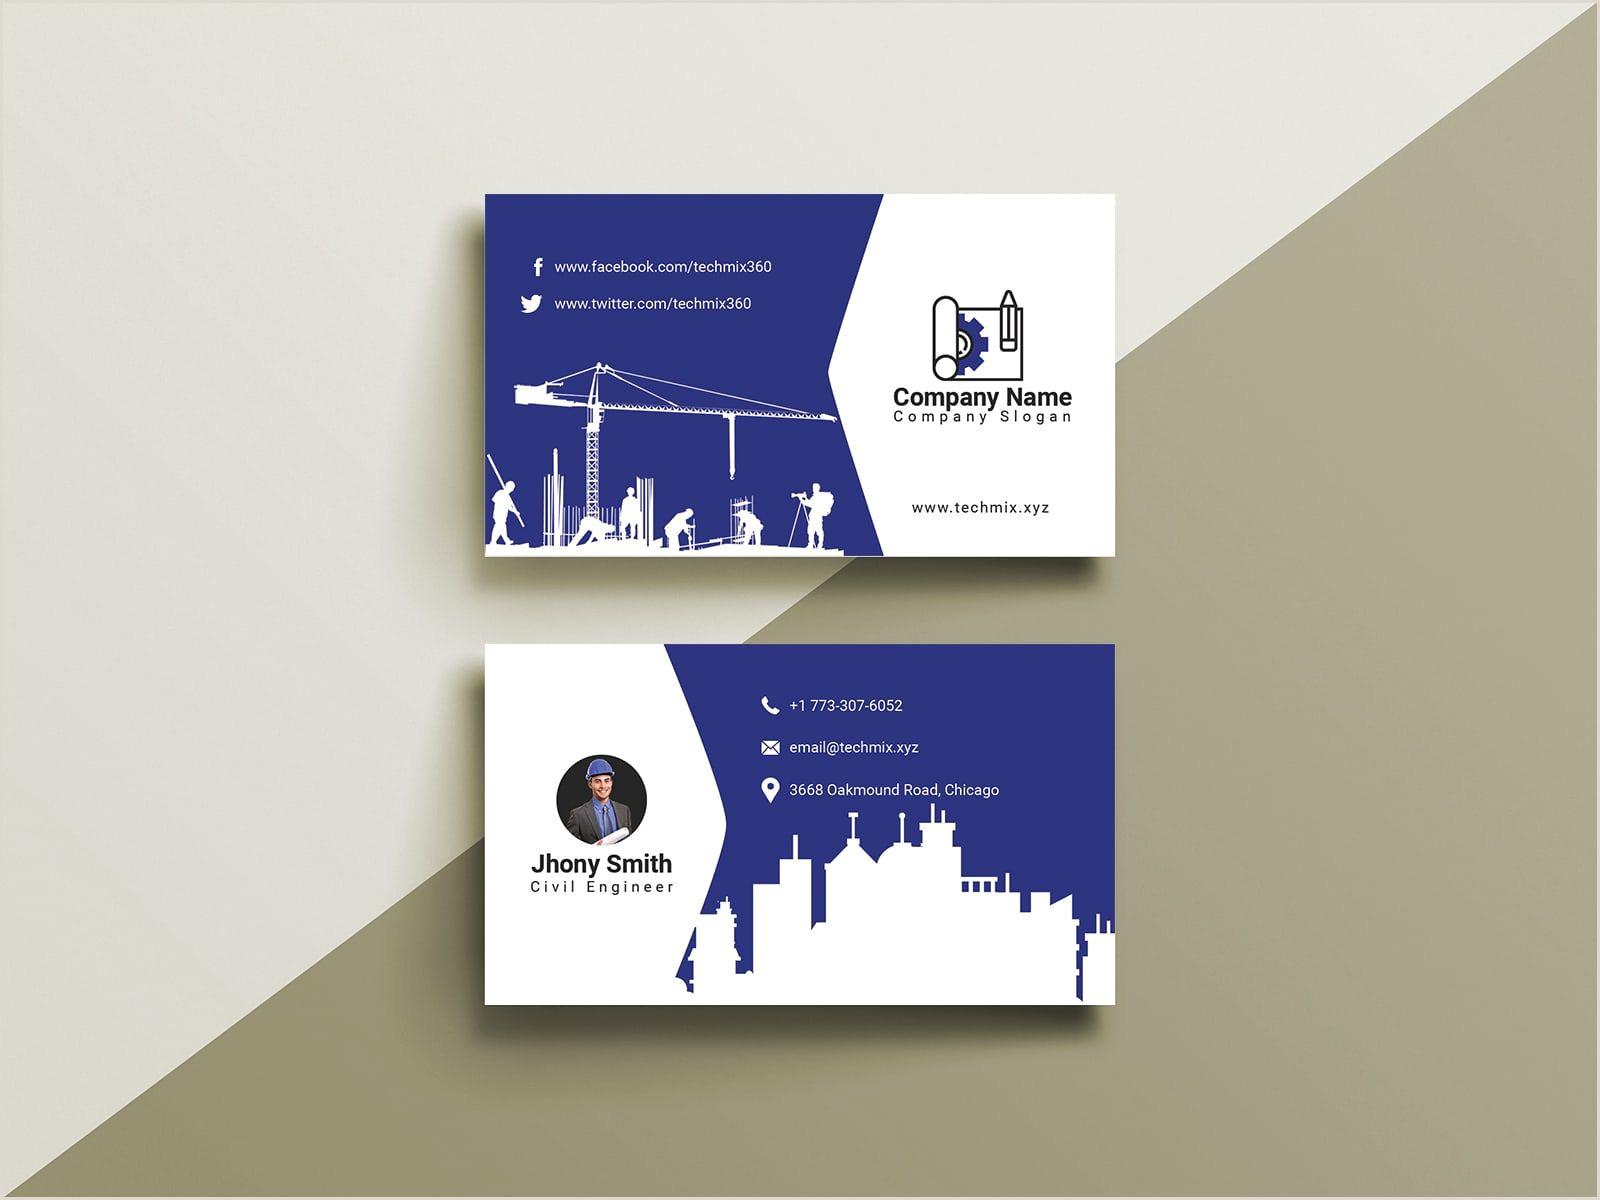 Best Business Cards Website 10 Civil Engineer Business Cards Images